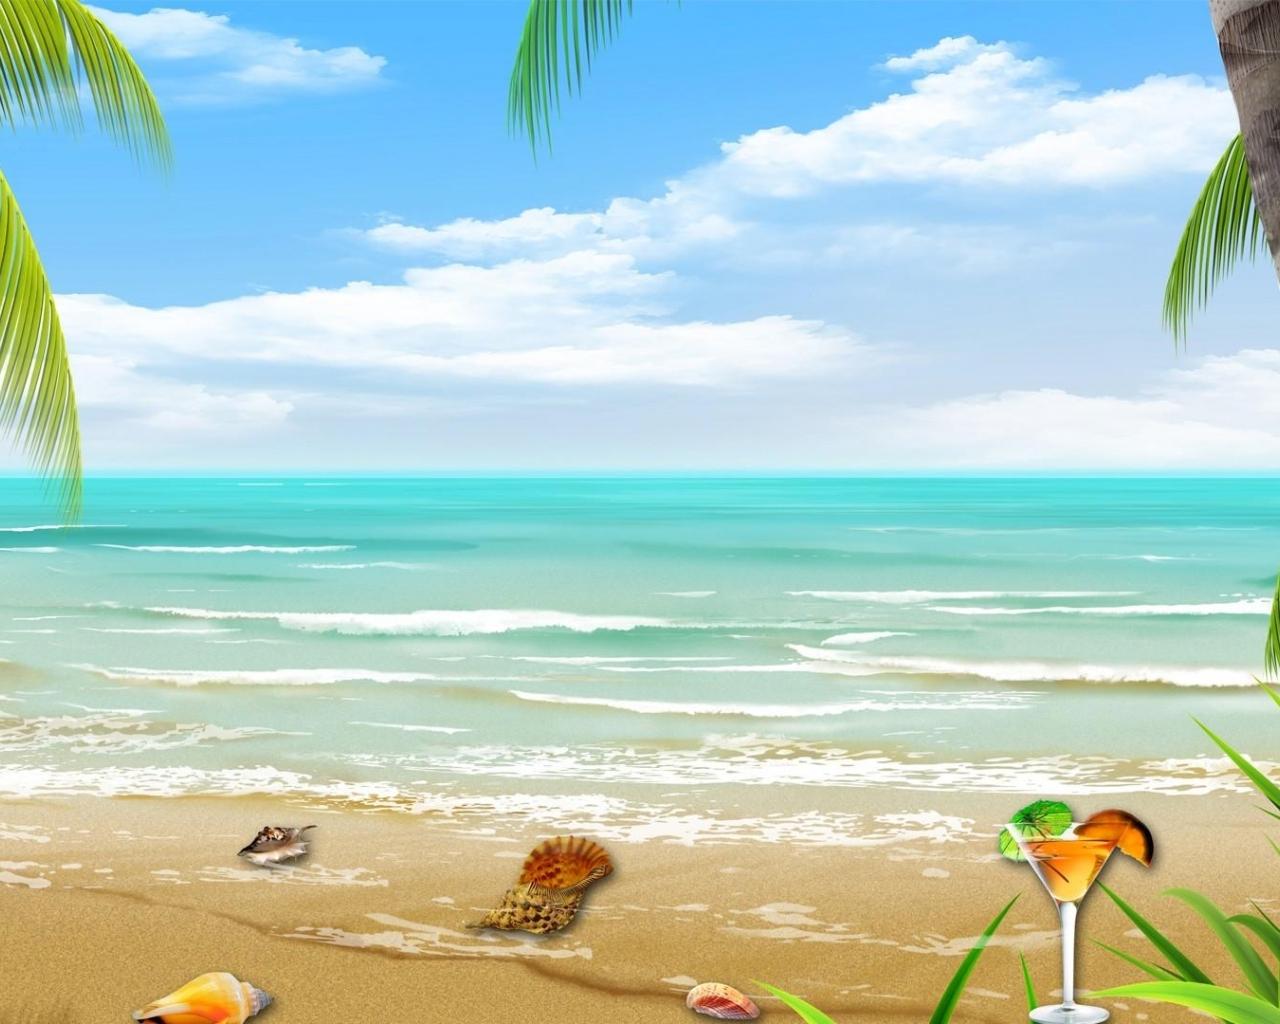 Hd Tropical Island Beach Paradise Wallpapers And Backgrounds: Tropical Beach HD Wallpaper